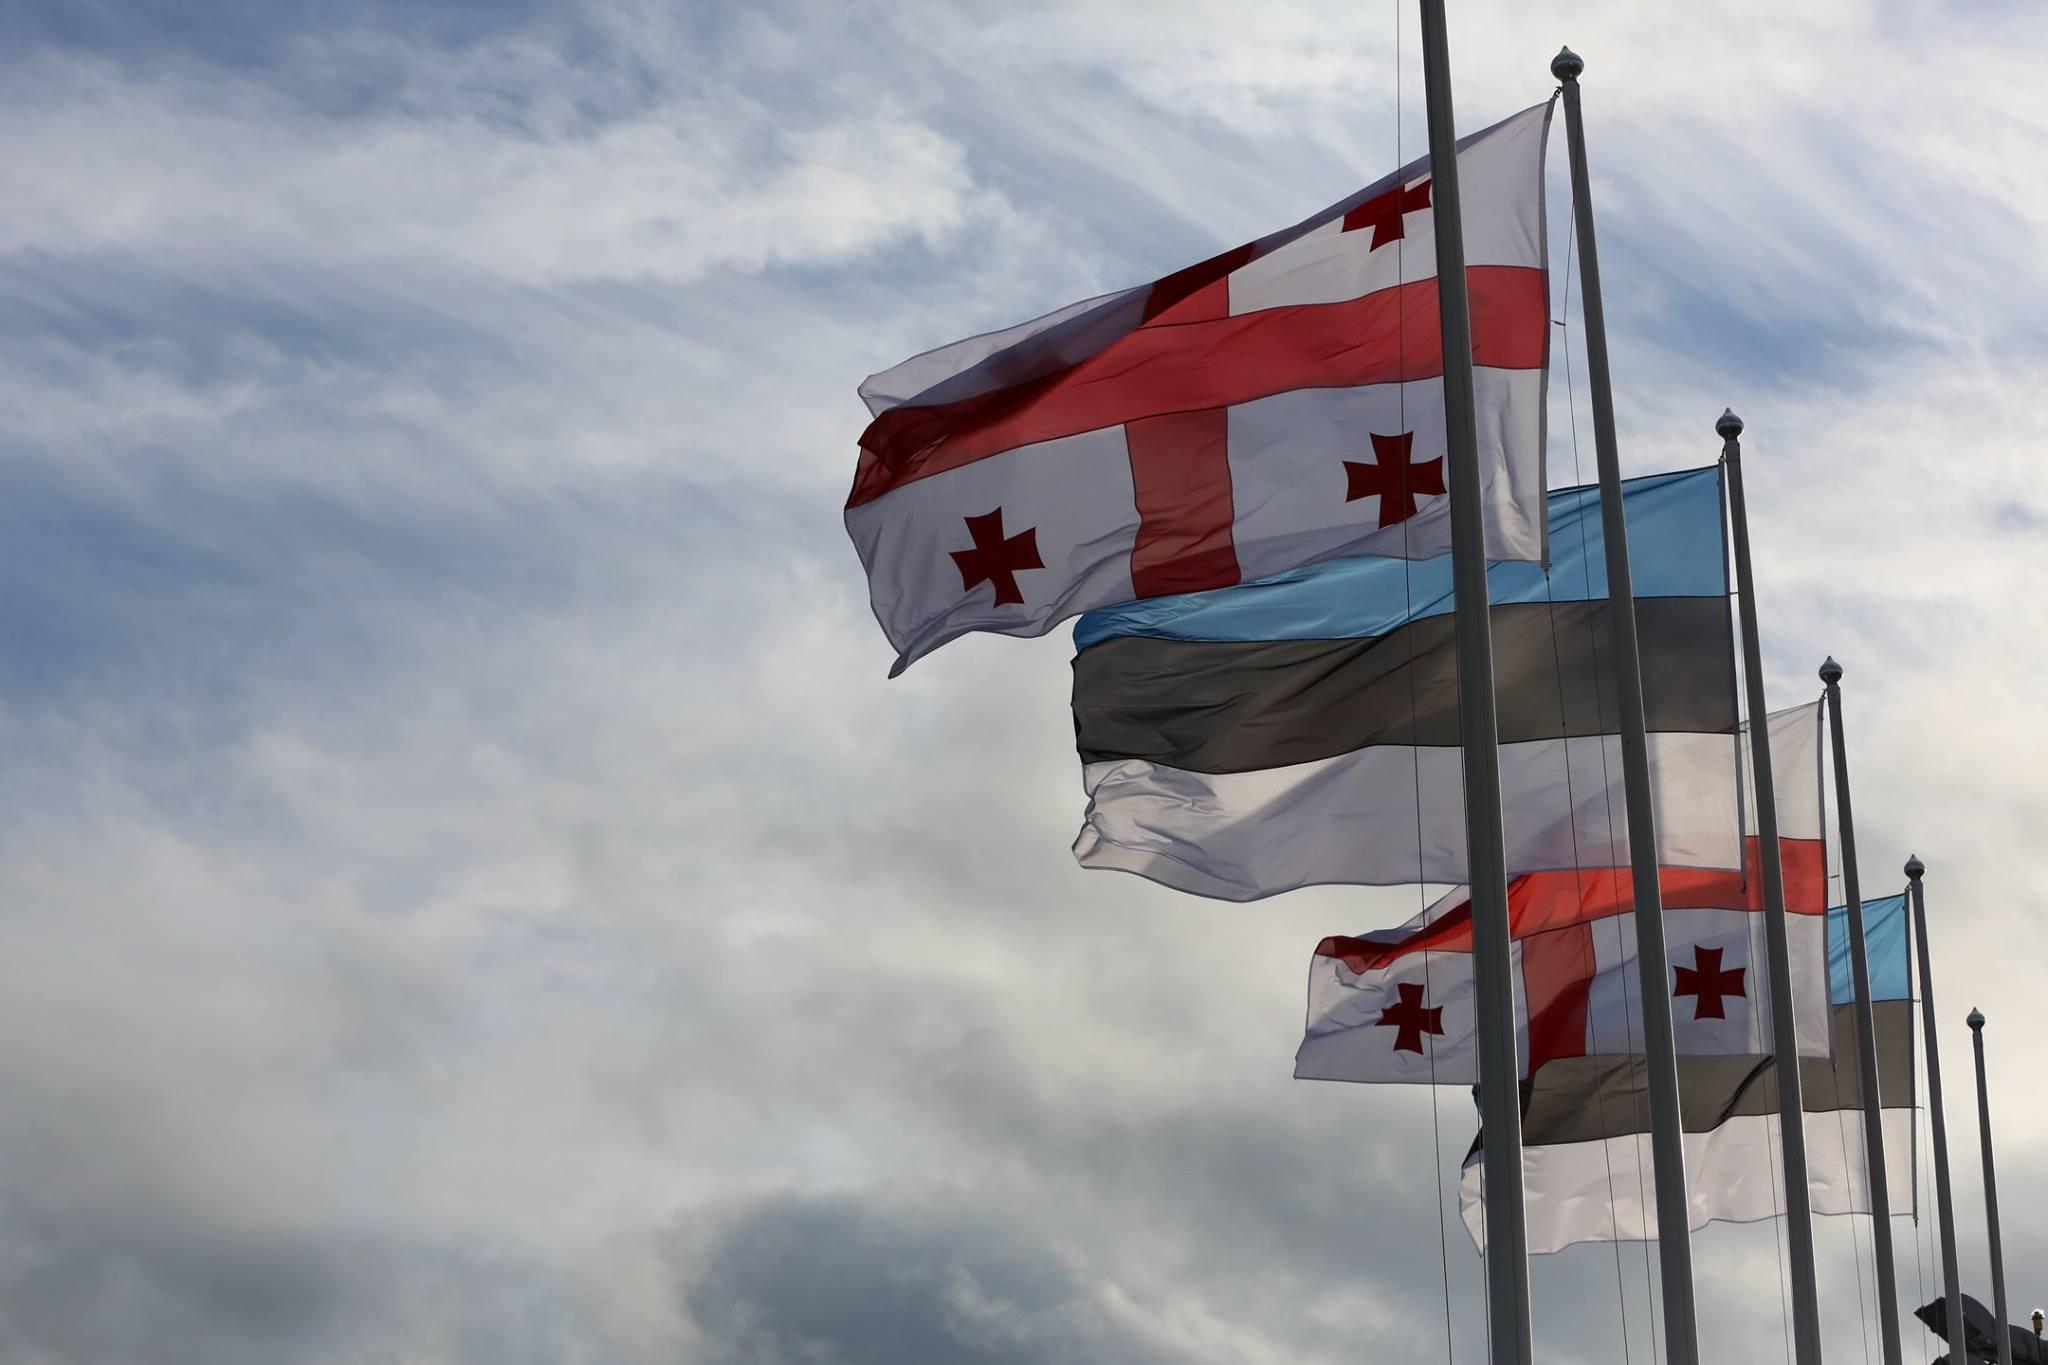 Georgia Estonia Flags #новости задержание Ники Мелия, кризис Мечты, Латвия, Литва, Эстония